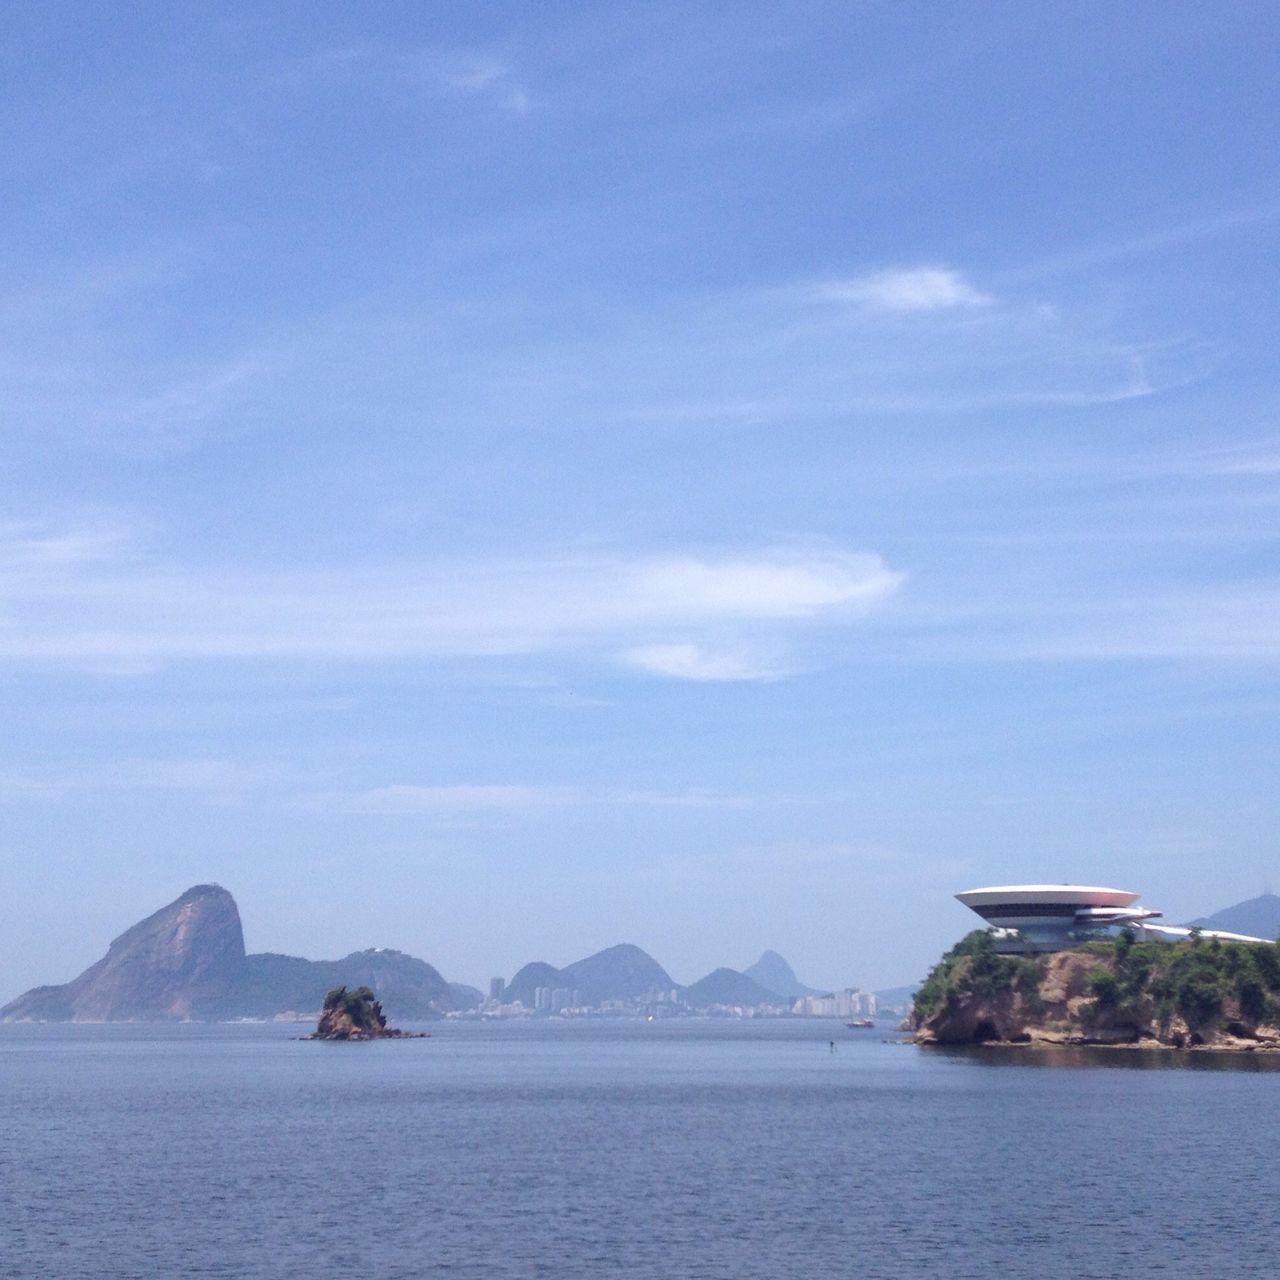 Sky Baía De Guanabara Rio De Janeiro Brazil Postal Naturelovers